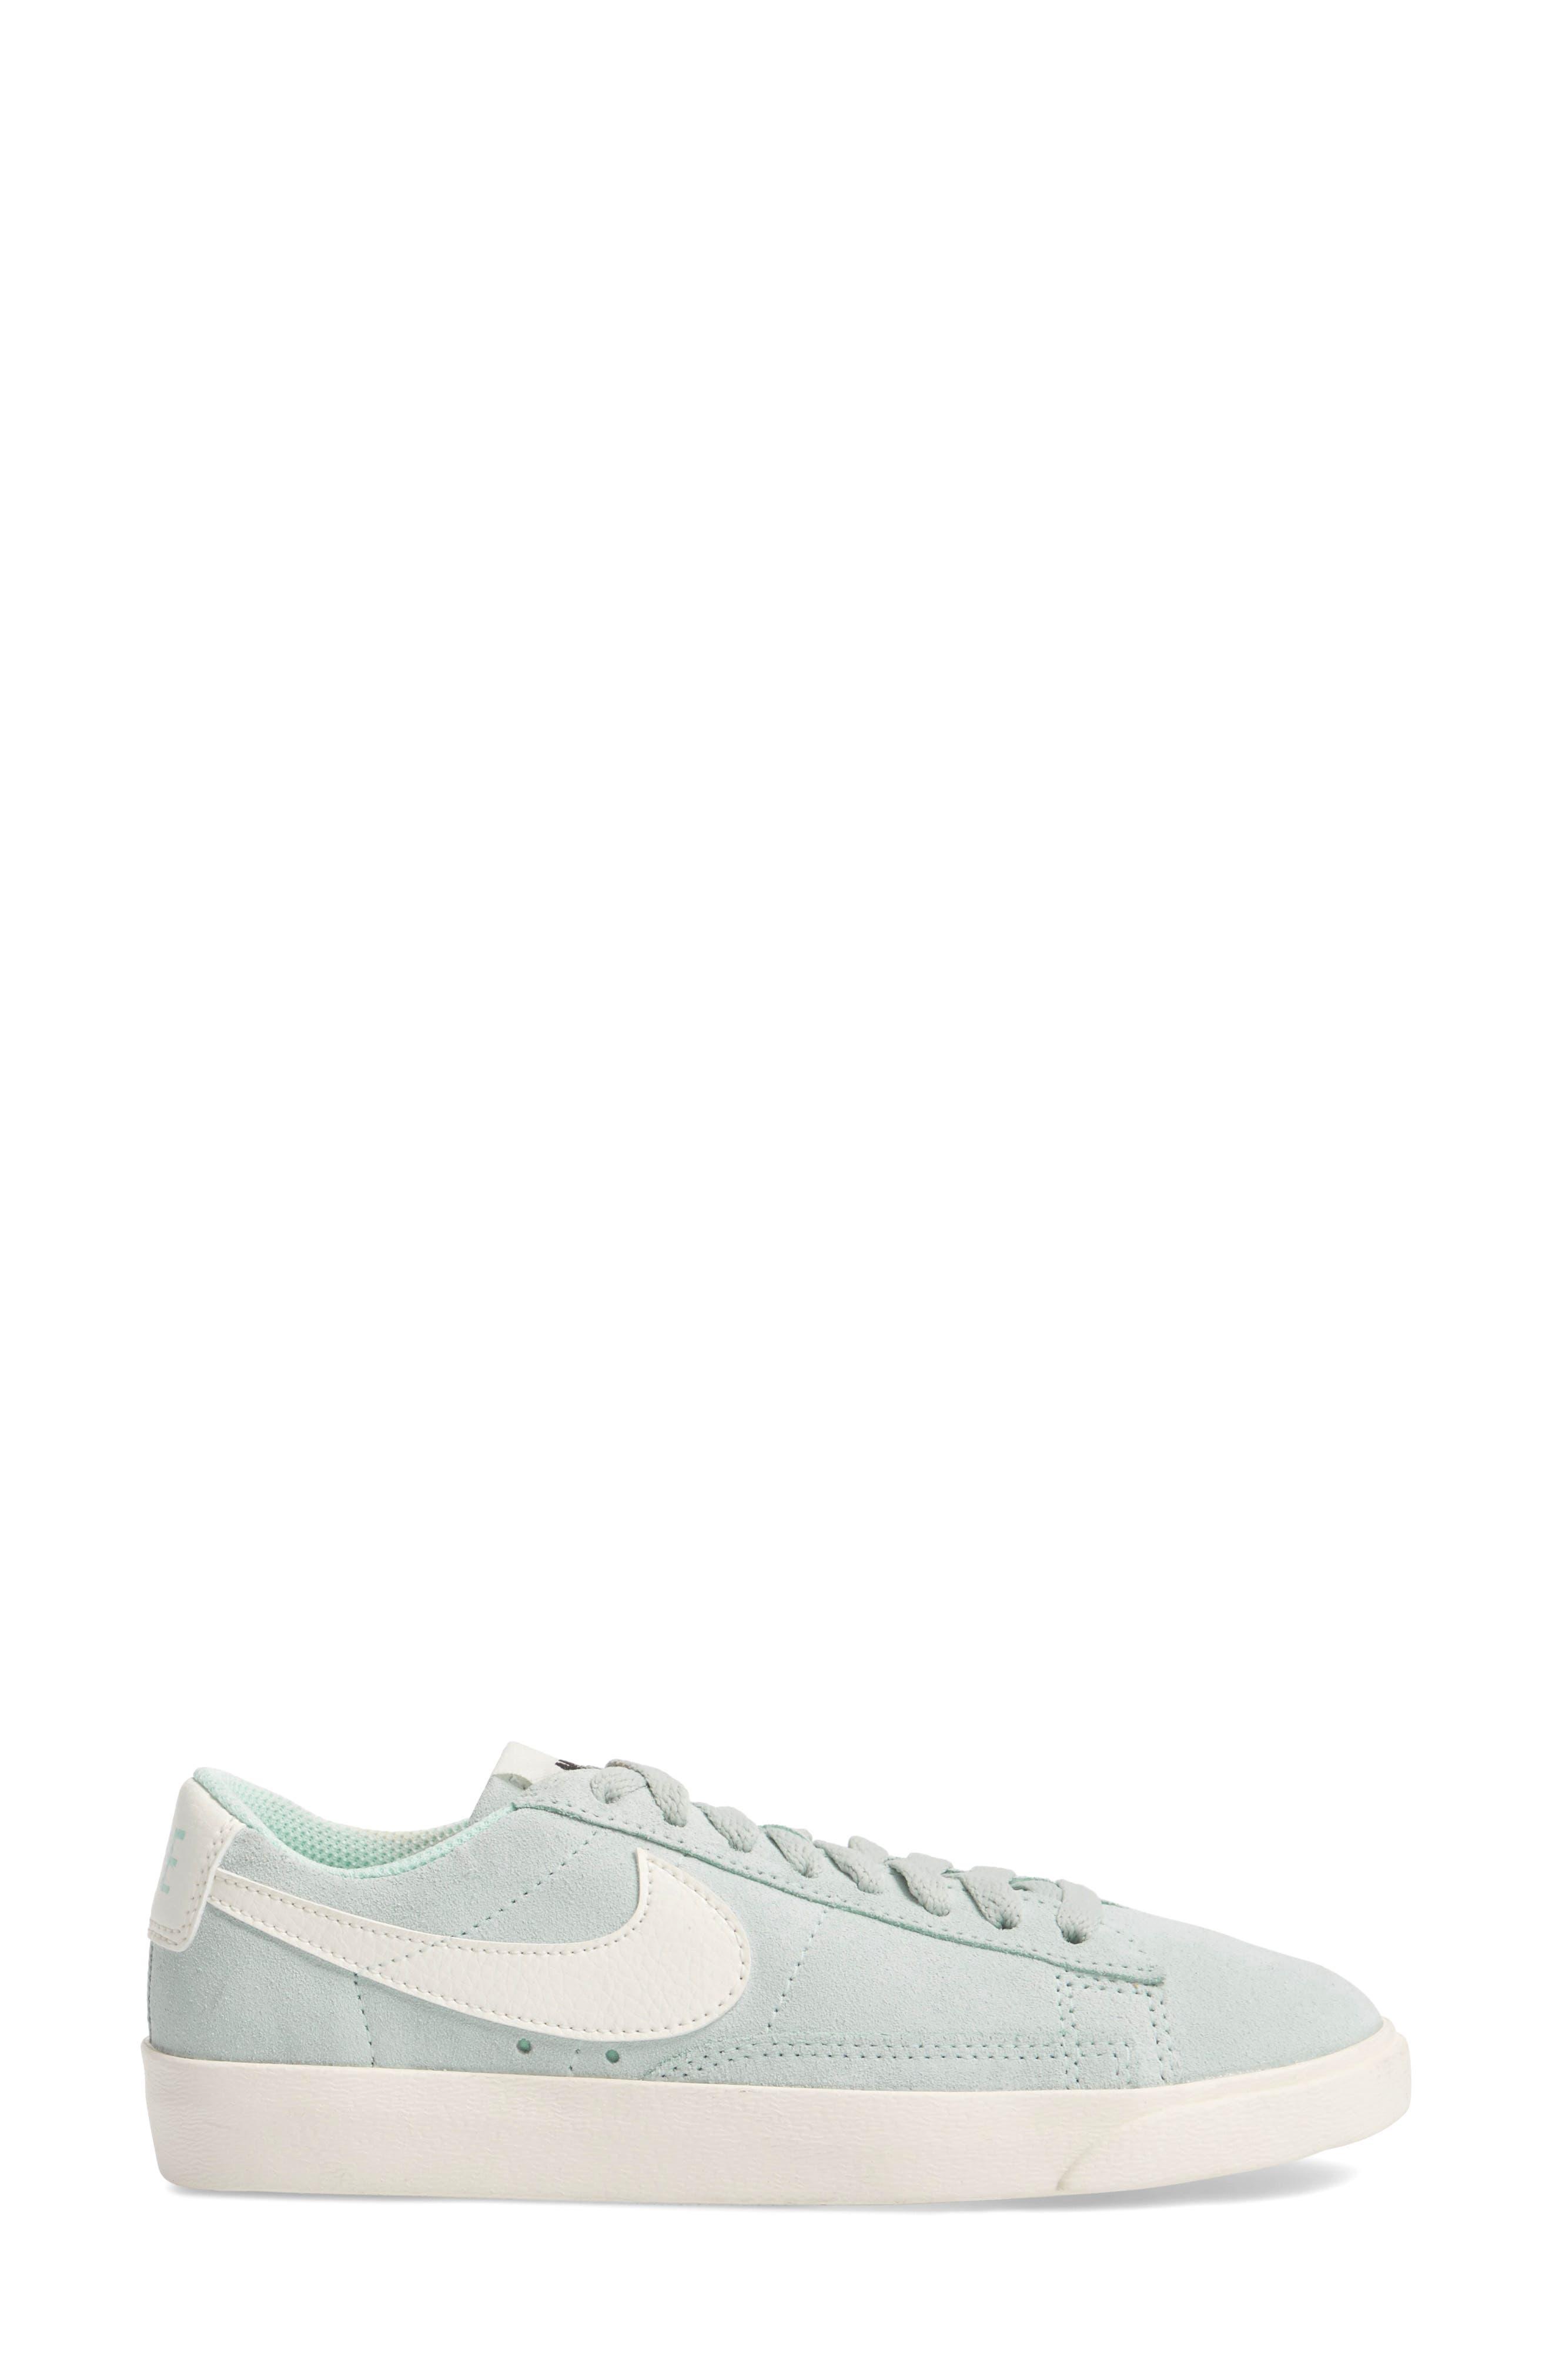 Blazer Low Sneaker,                             Alternate thumbnail 13, color,